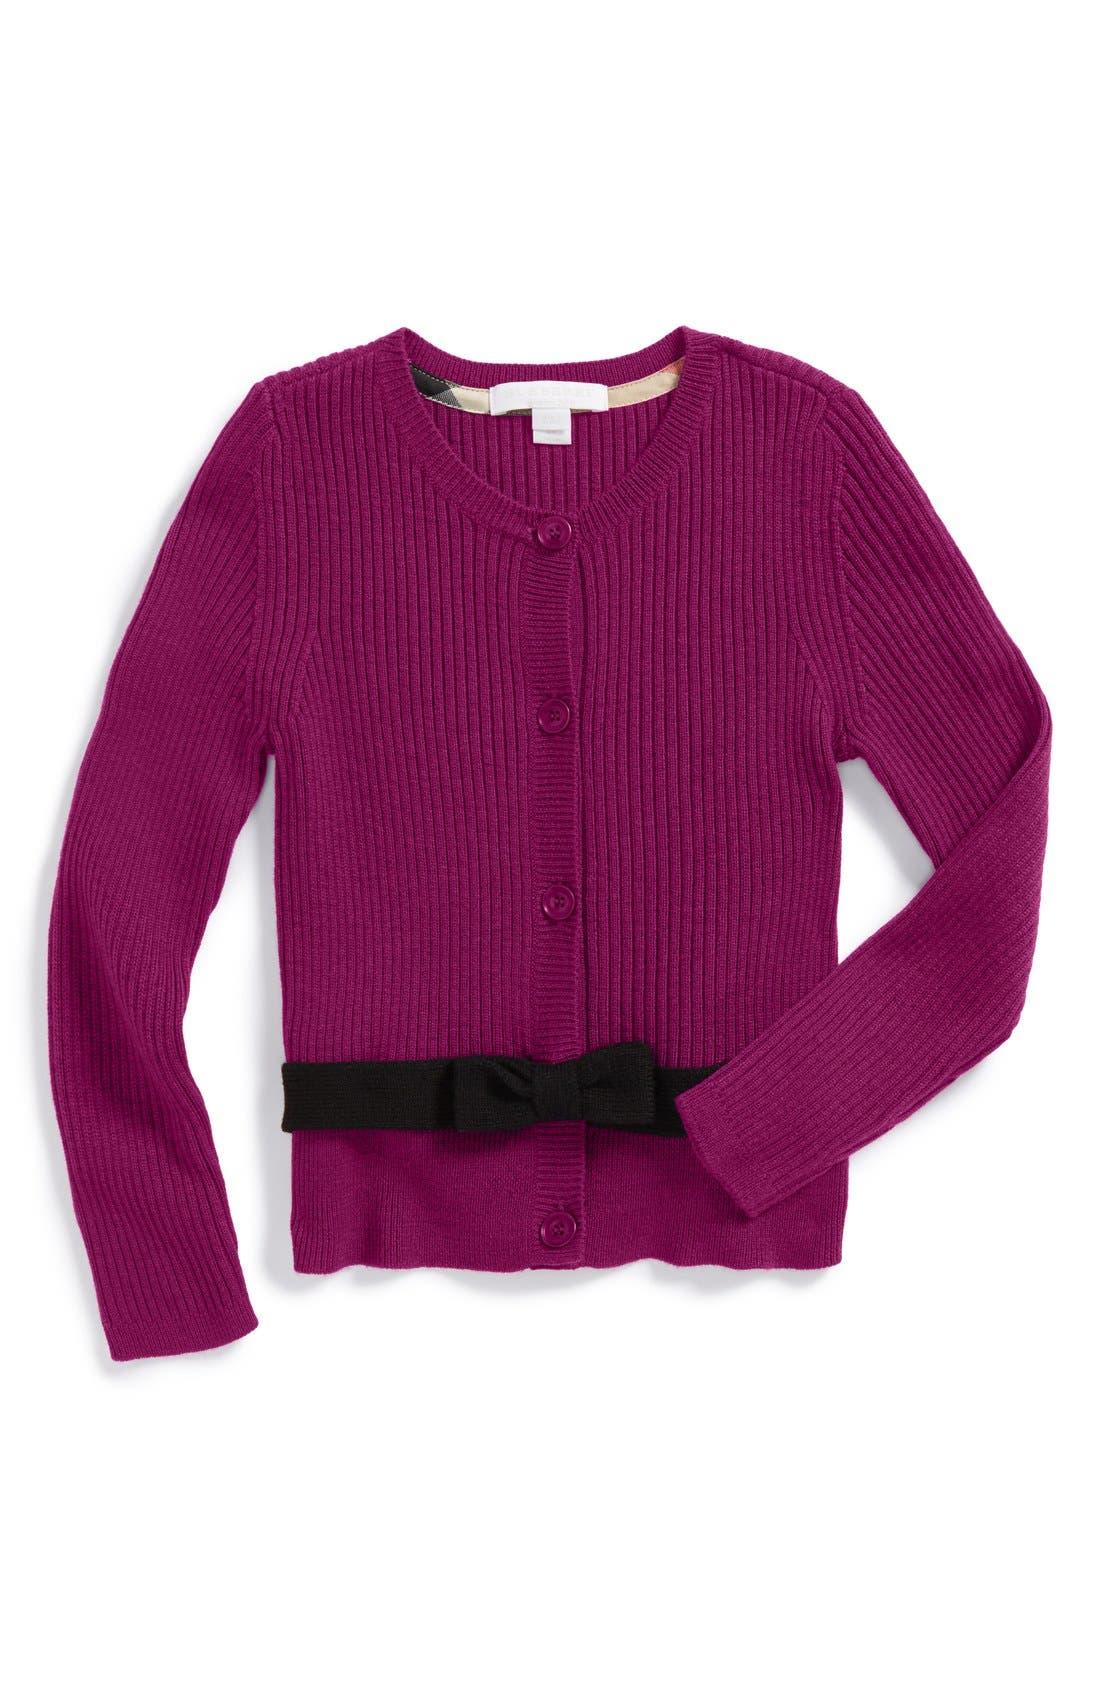 Alternate Image 1 Selected - Burberry Merino Wool Belted Cardigan (Little Girls & Big Girls)